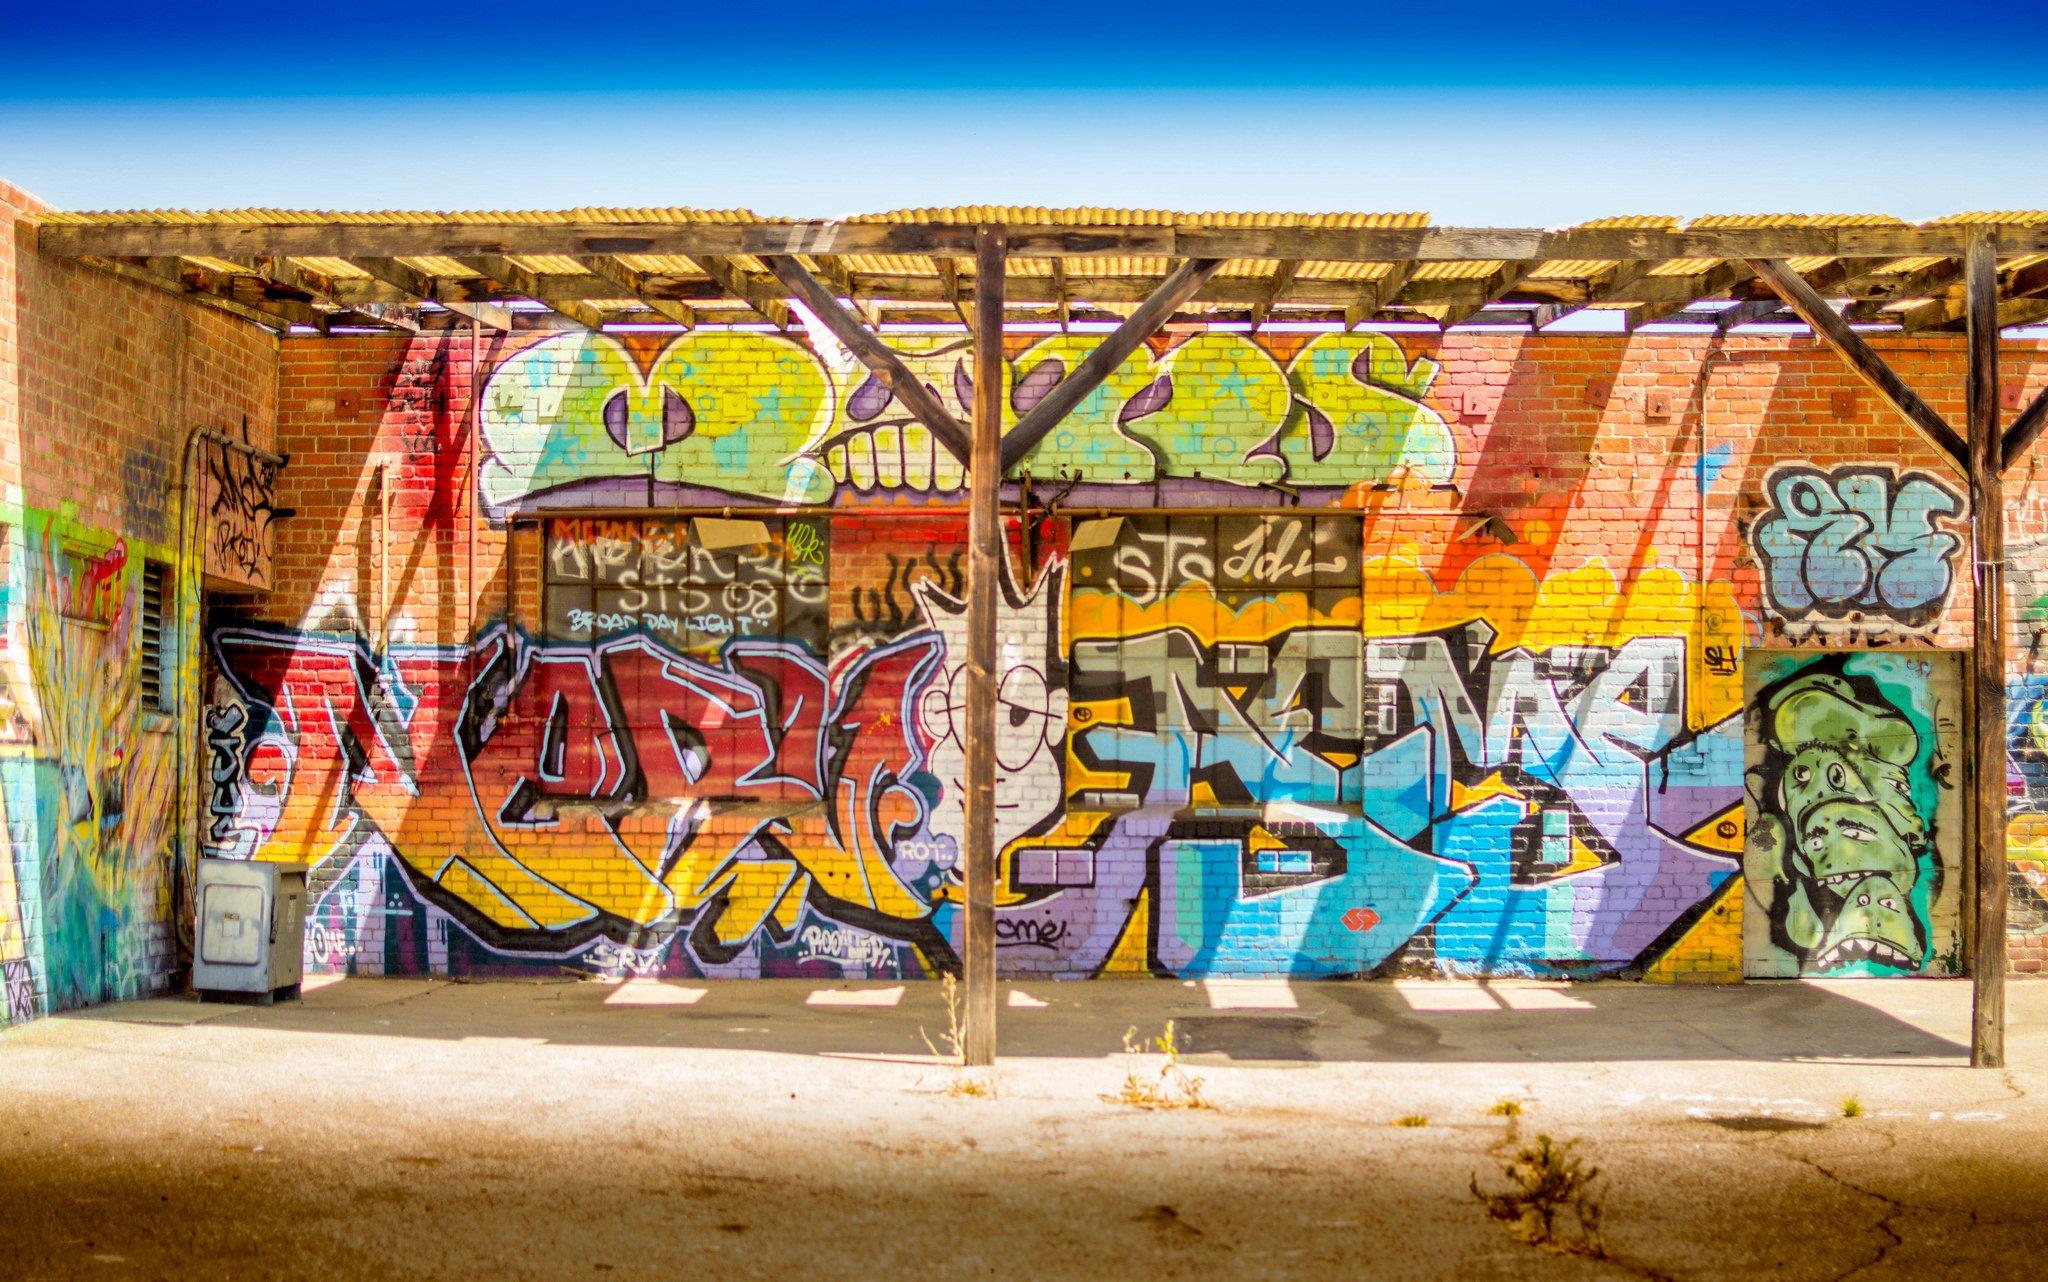 Los Angeles California Pacific Buildings Cities Graffiti Colors Graff Wall Art Street Illegal City Wallpaper 2048x1282 450555 Wallpaperup